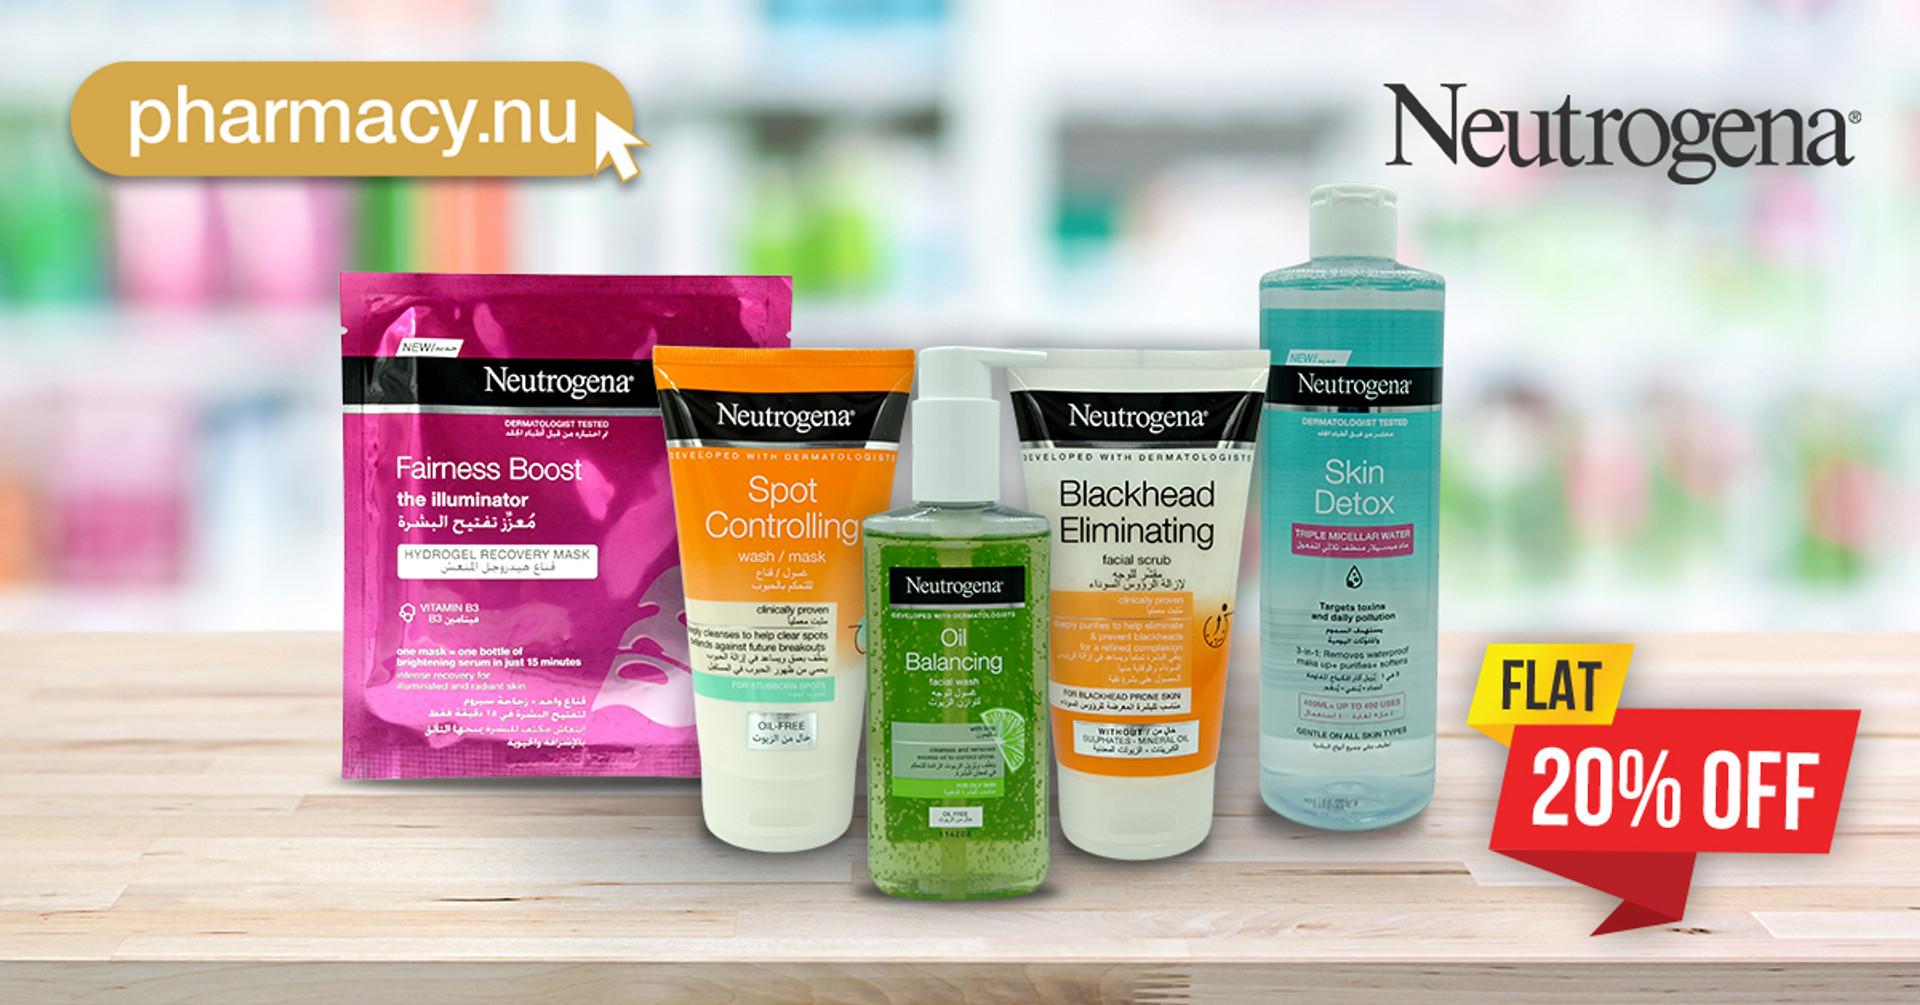 Neutrogena Skin Care is Flat 20% Off